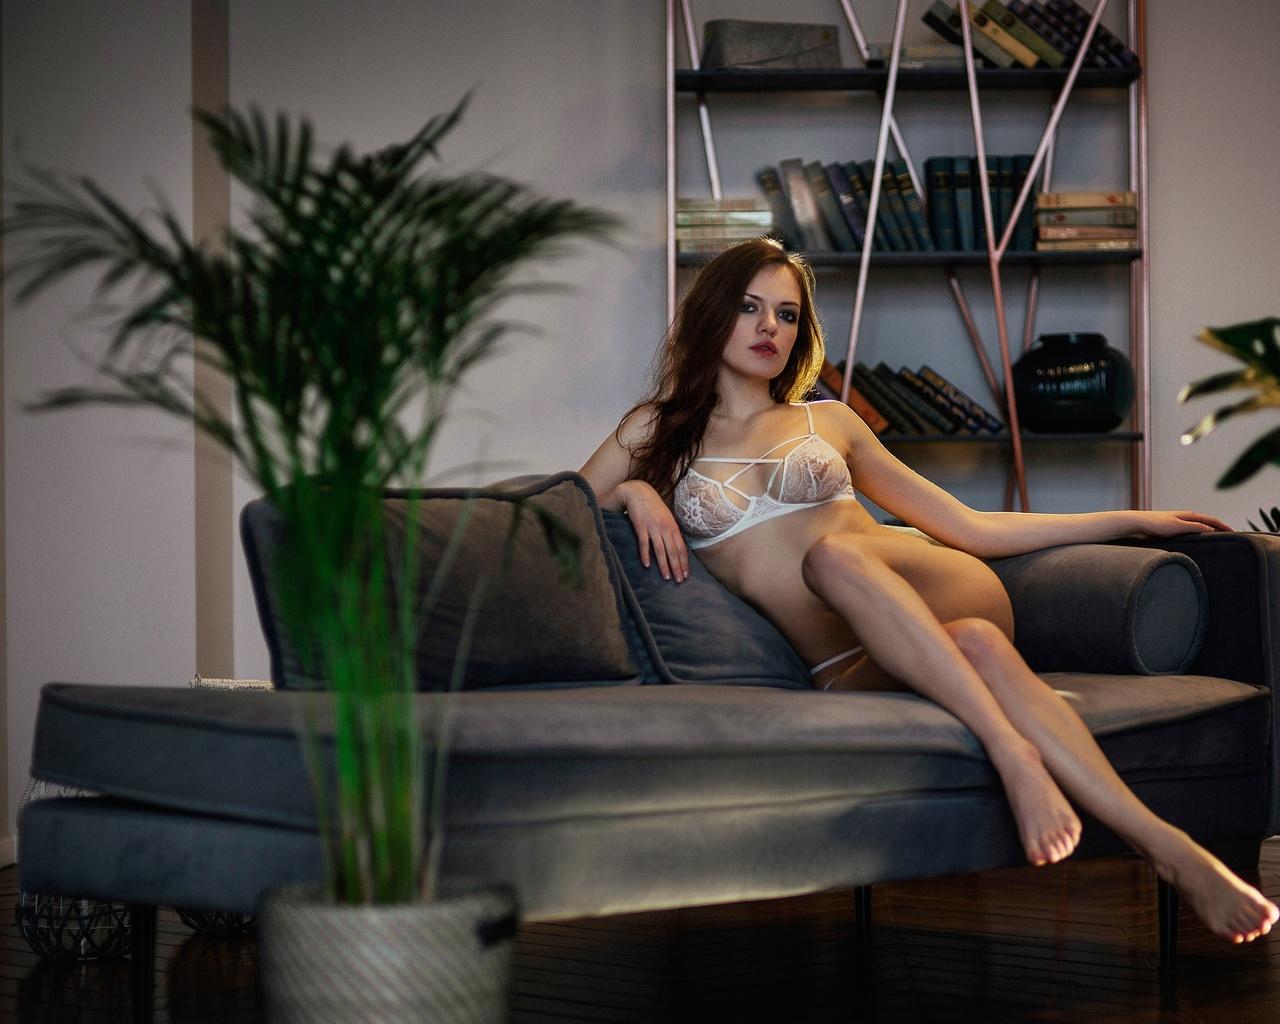 polly bound, девушка, диван, подушки